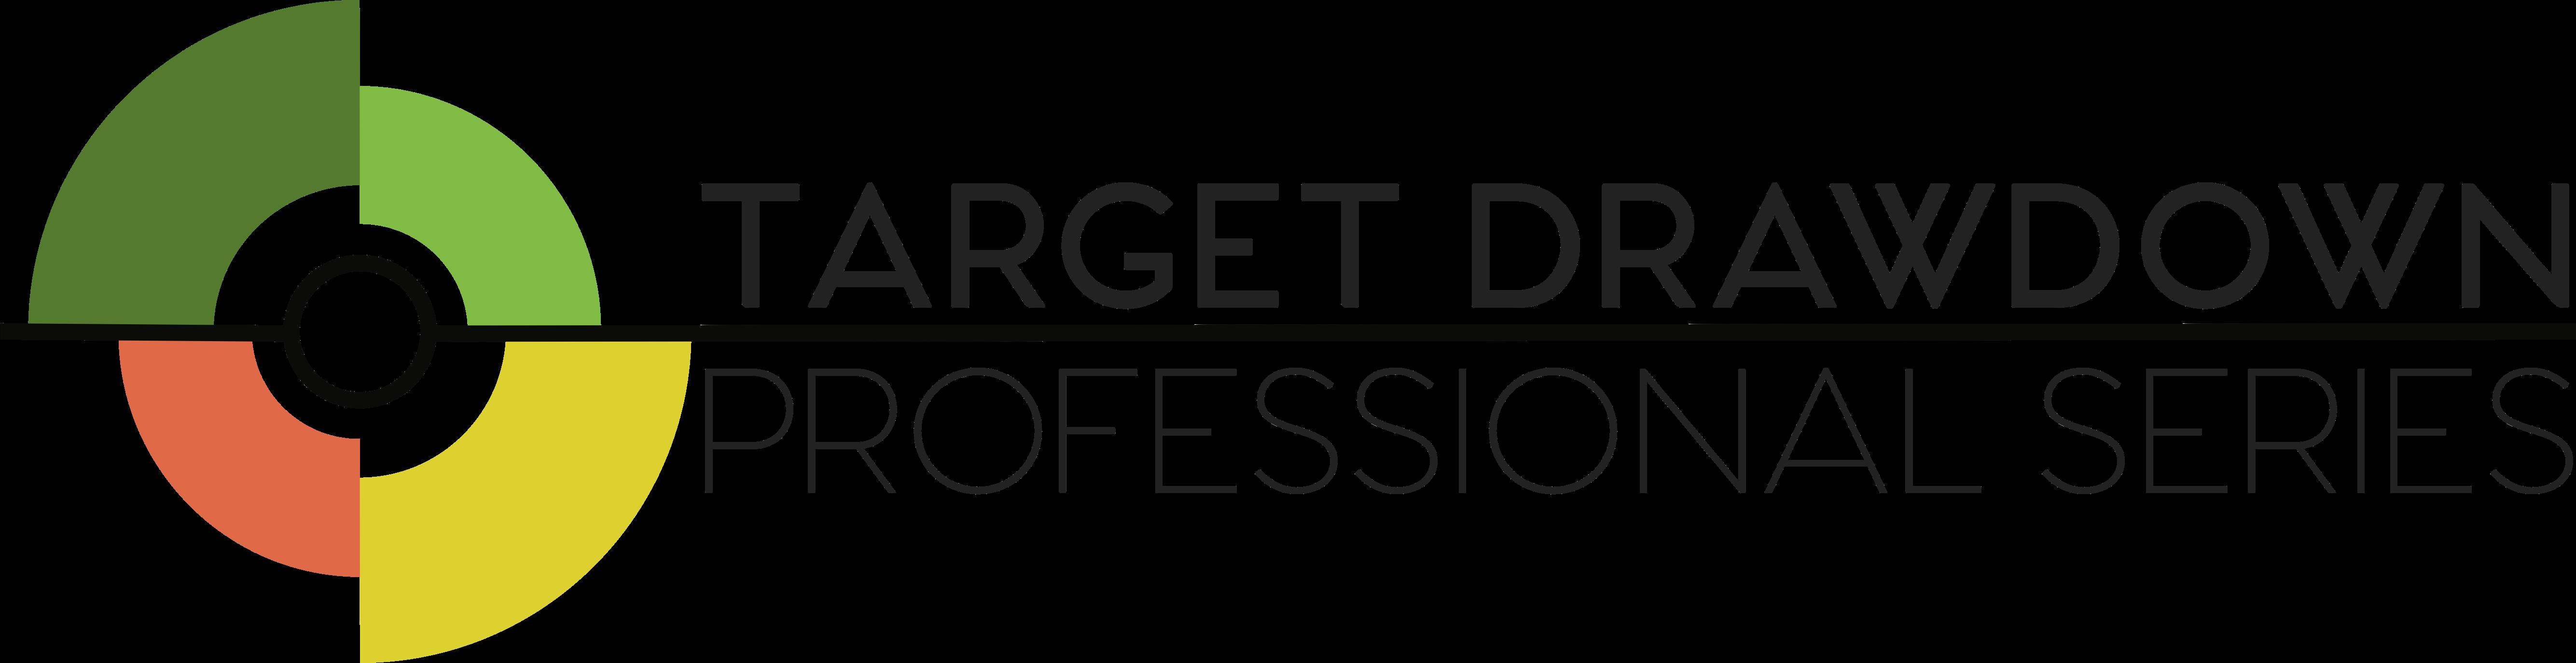 Target Drawdown Professional Series